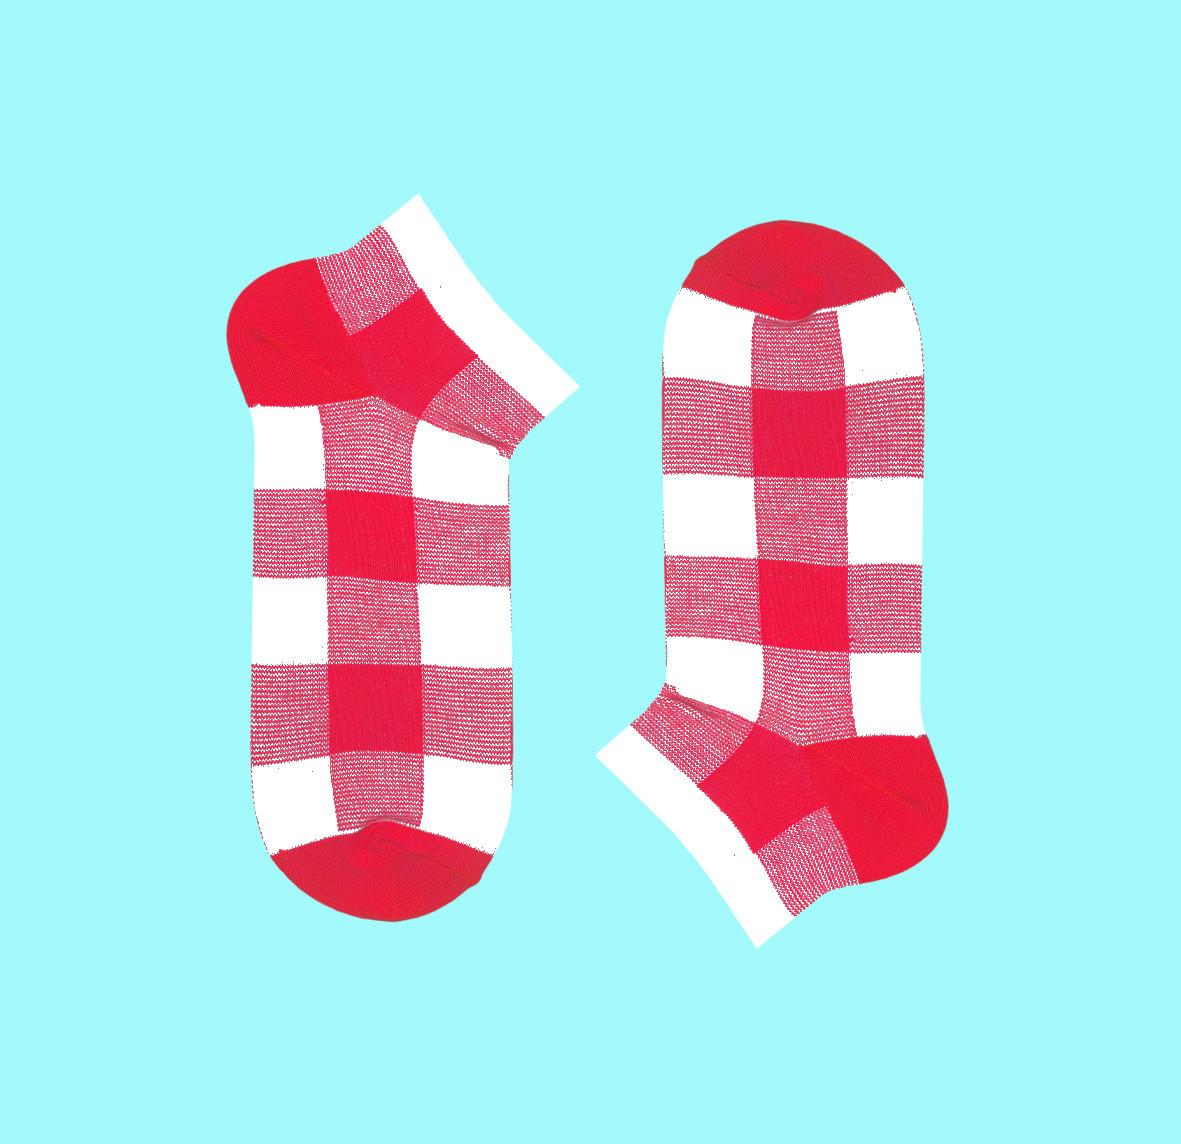 Короткие носки в клетку PINK-BEIGE TARTAN